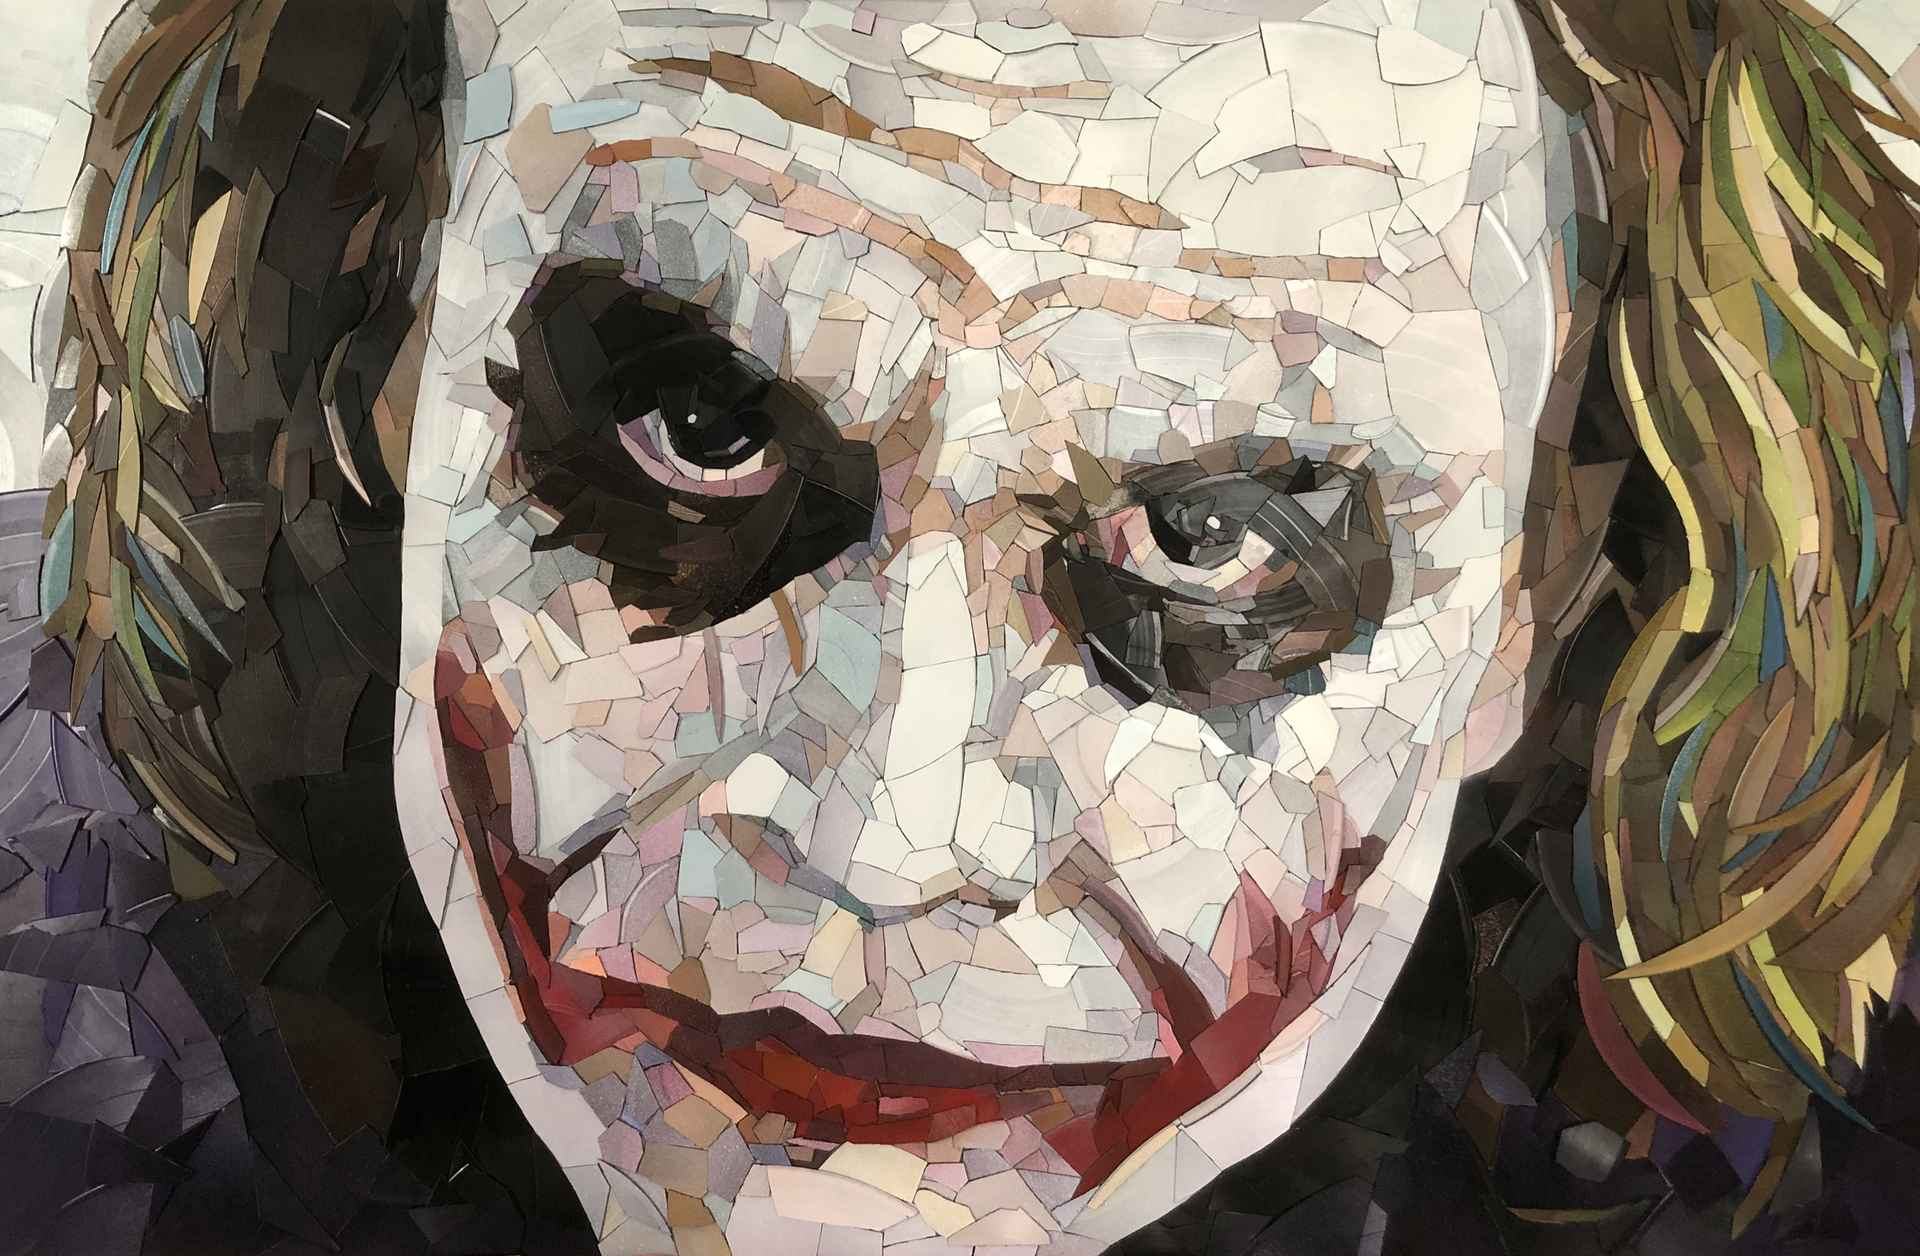 Dark Knight by Ed Chapman